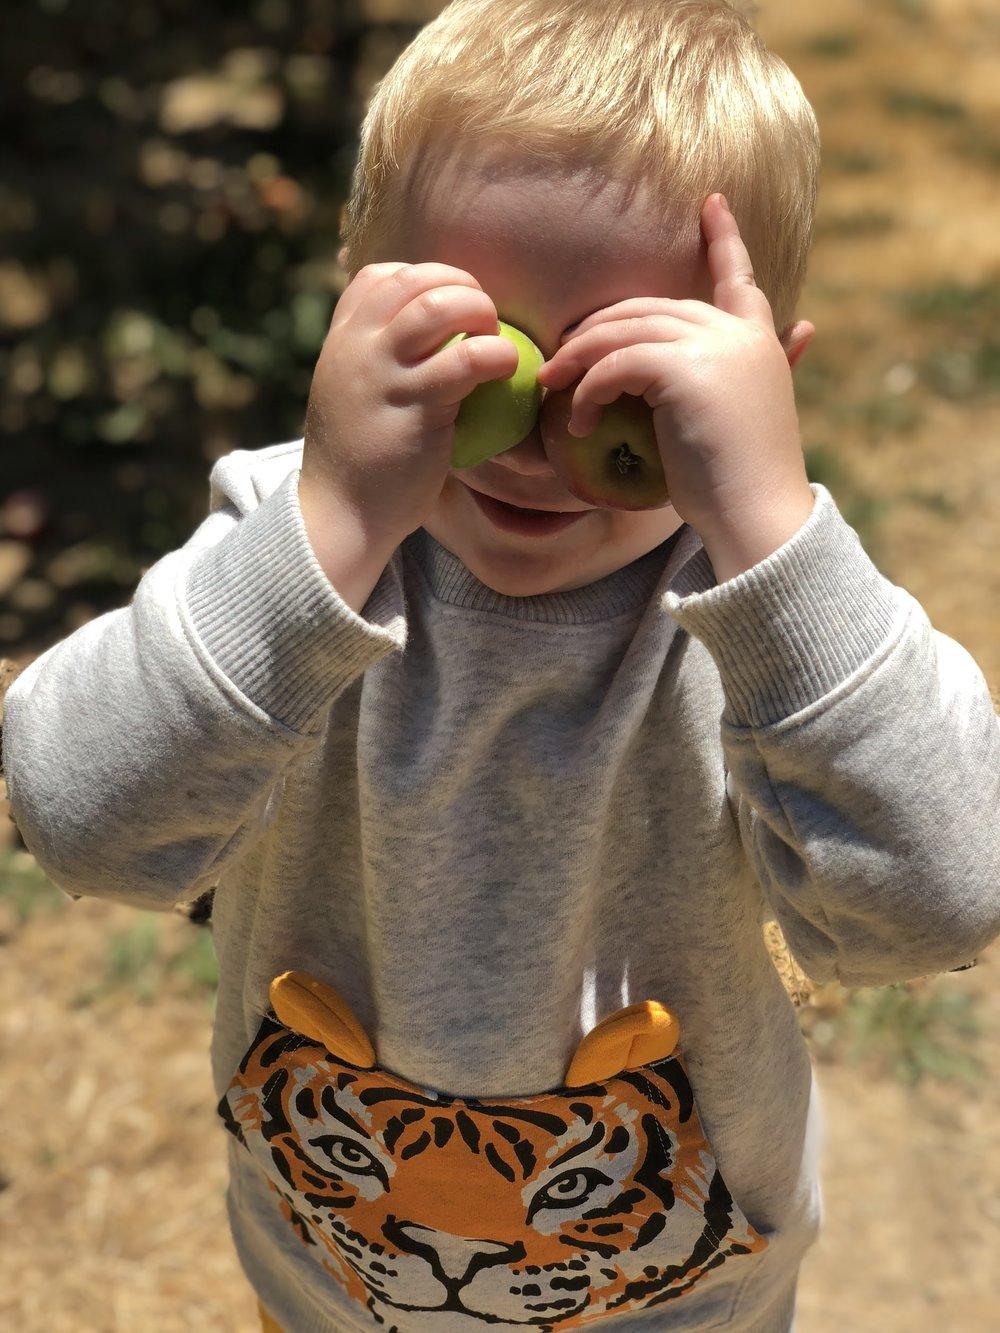 Picking Apples At Horse & Plow Sebastopol